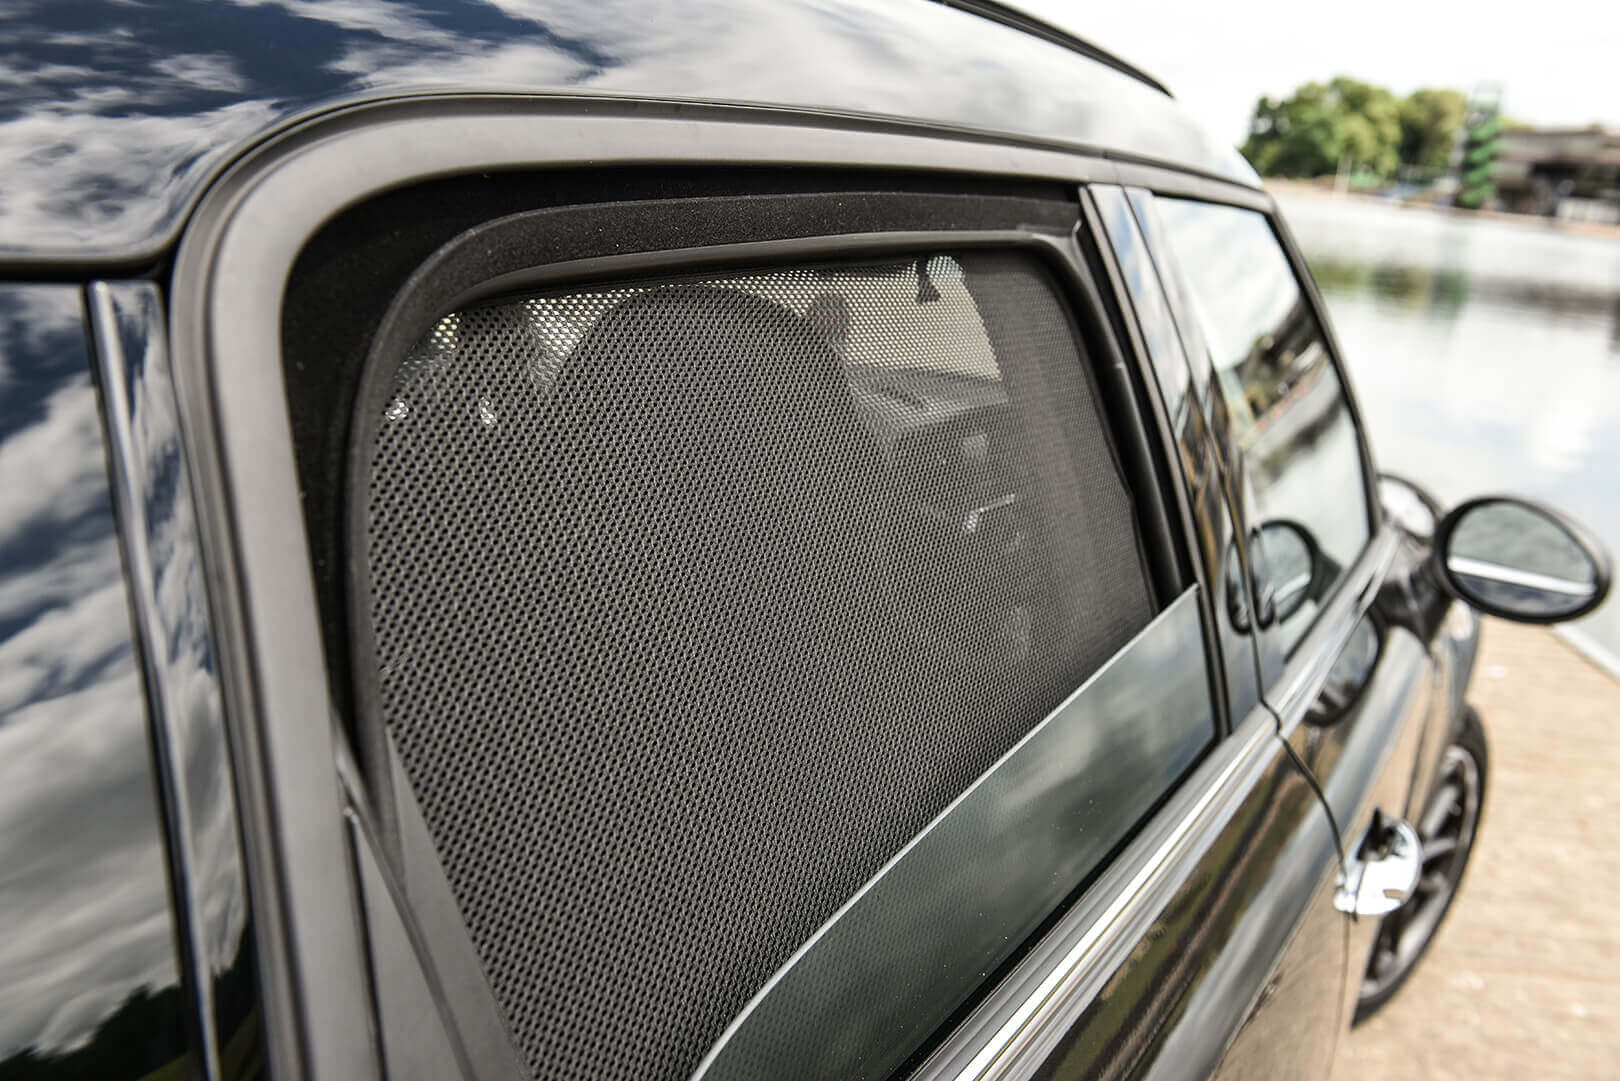 Uv Car Shades Land Rover Discovery 3 4 04 Rear Door Set